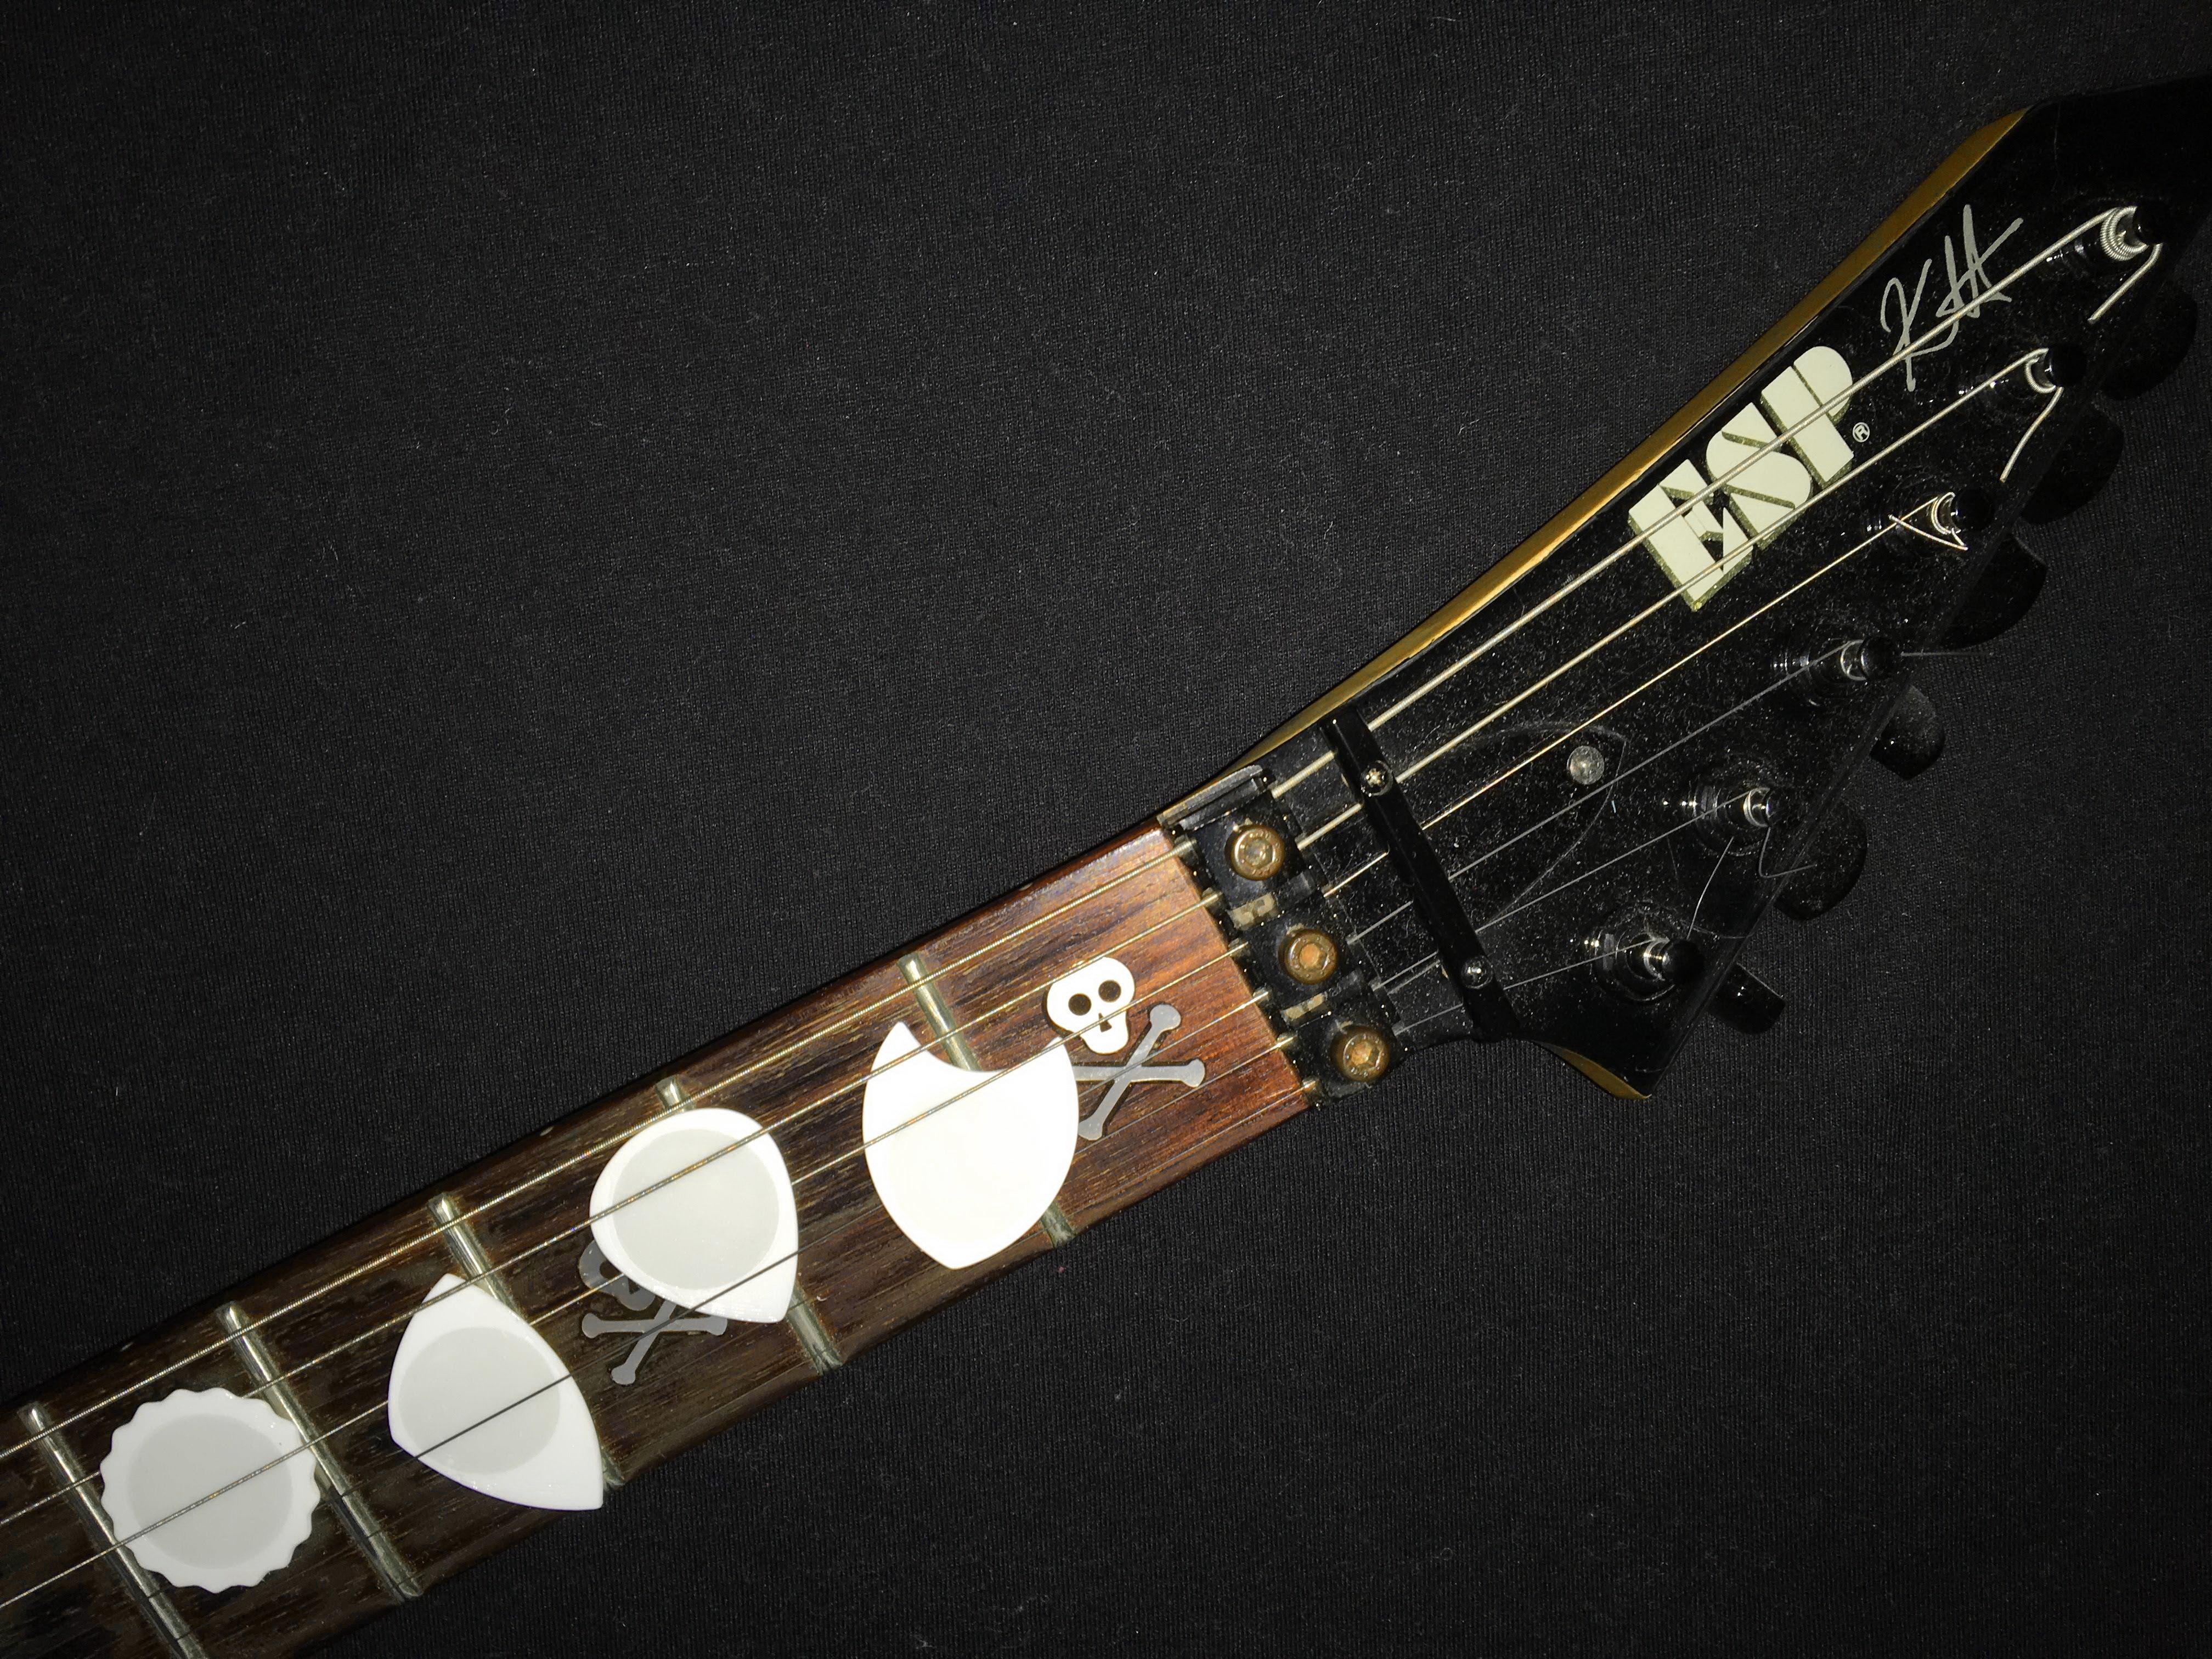 PITA DUA RADON UNU guitar ESP Km.JPG Download free STL file UNU R10'5 26X31 - PLA & TPU Electric Guitar Nest Pipe White • 3D printable design, carleslluisar